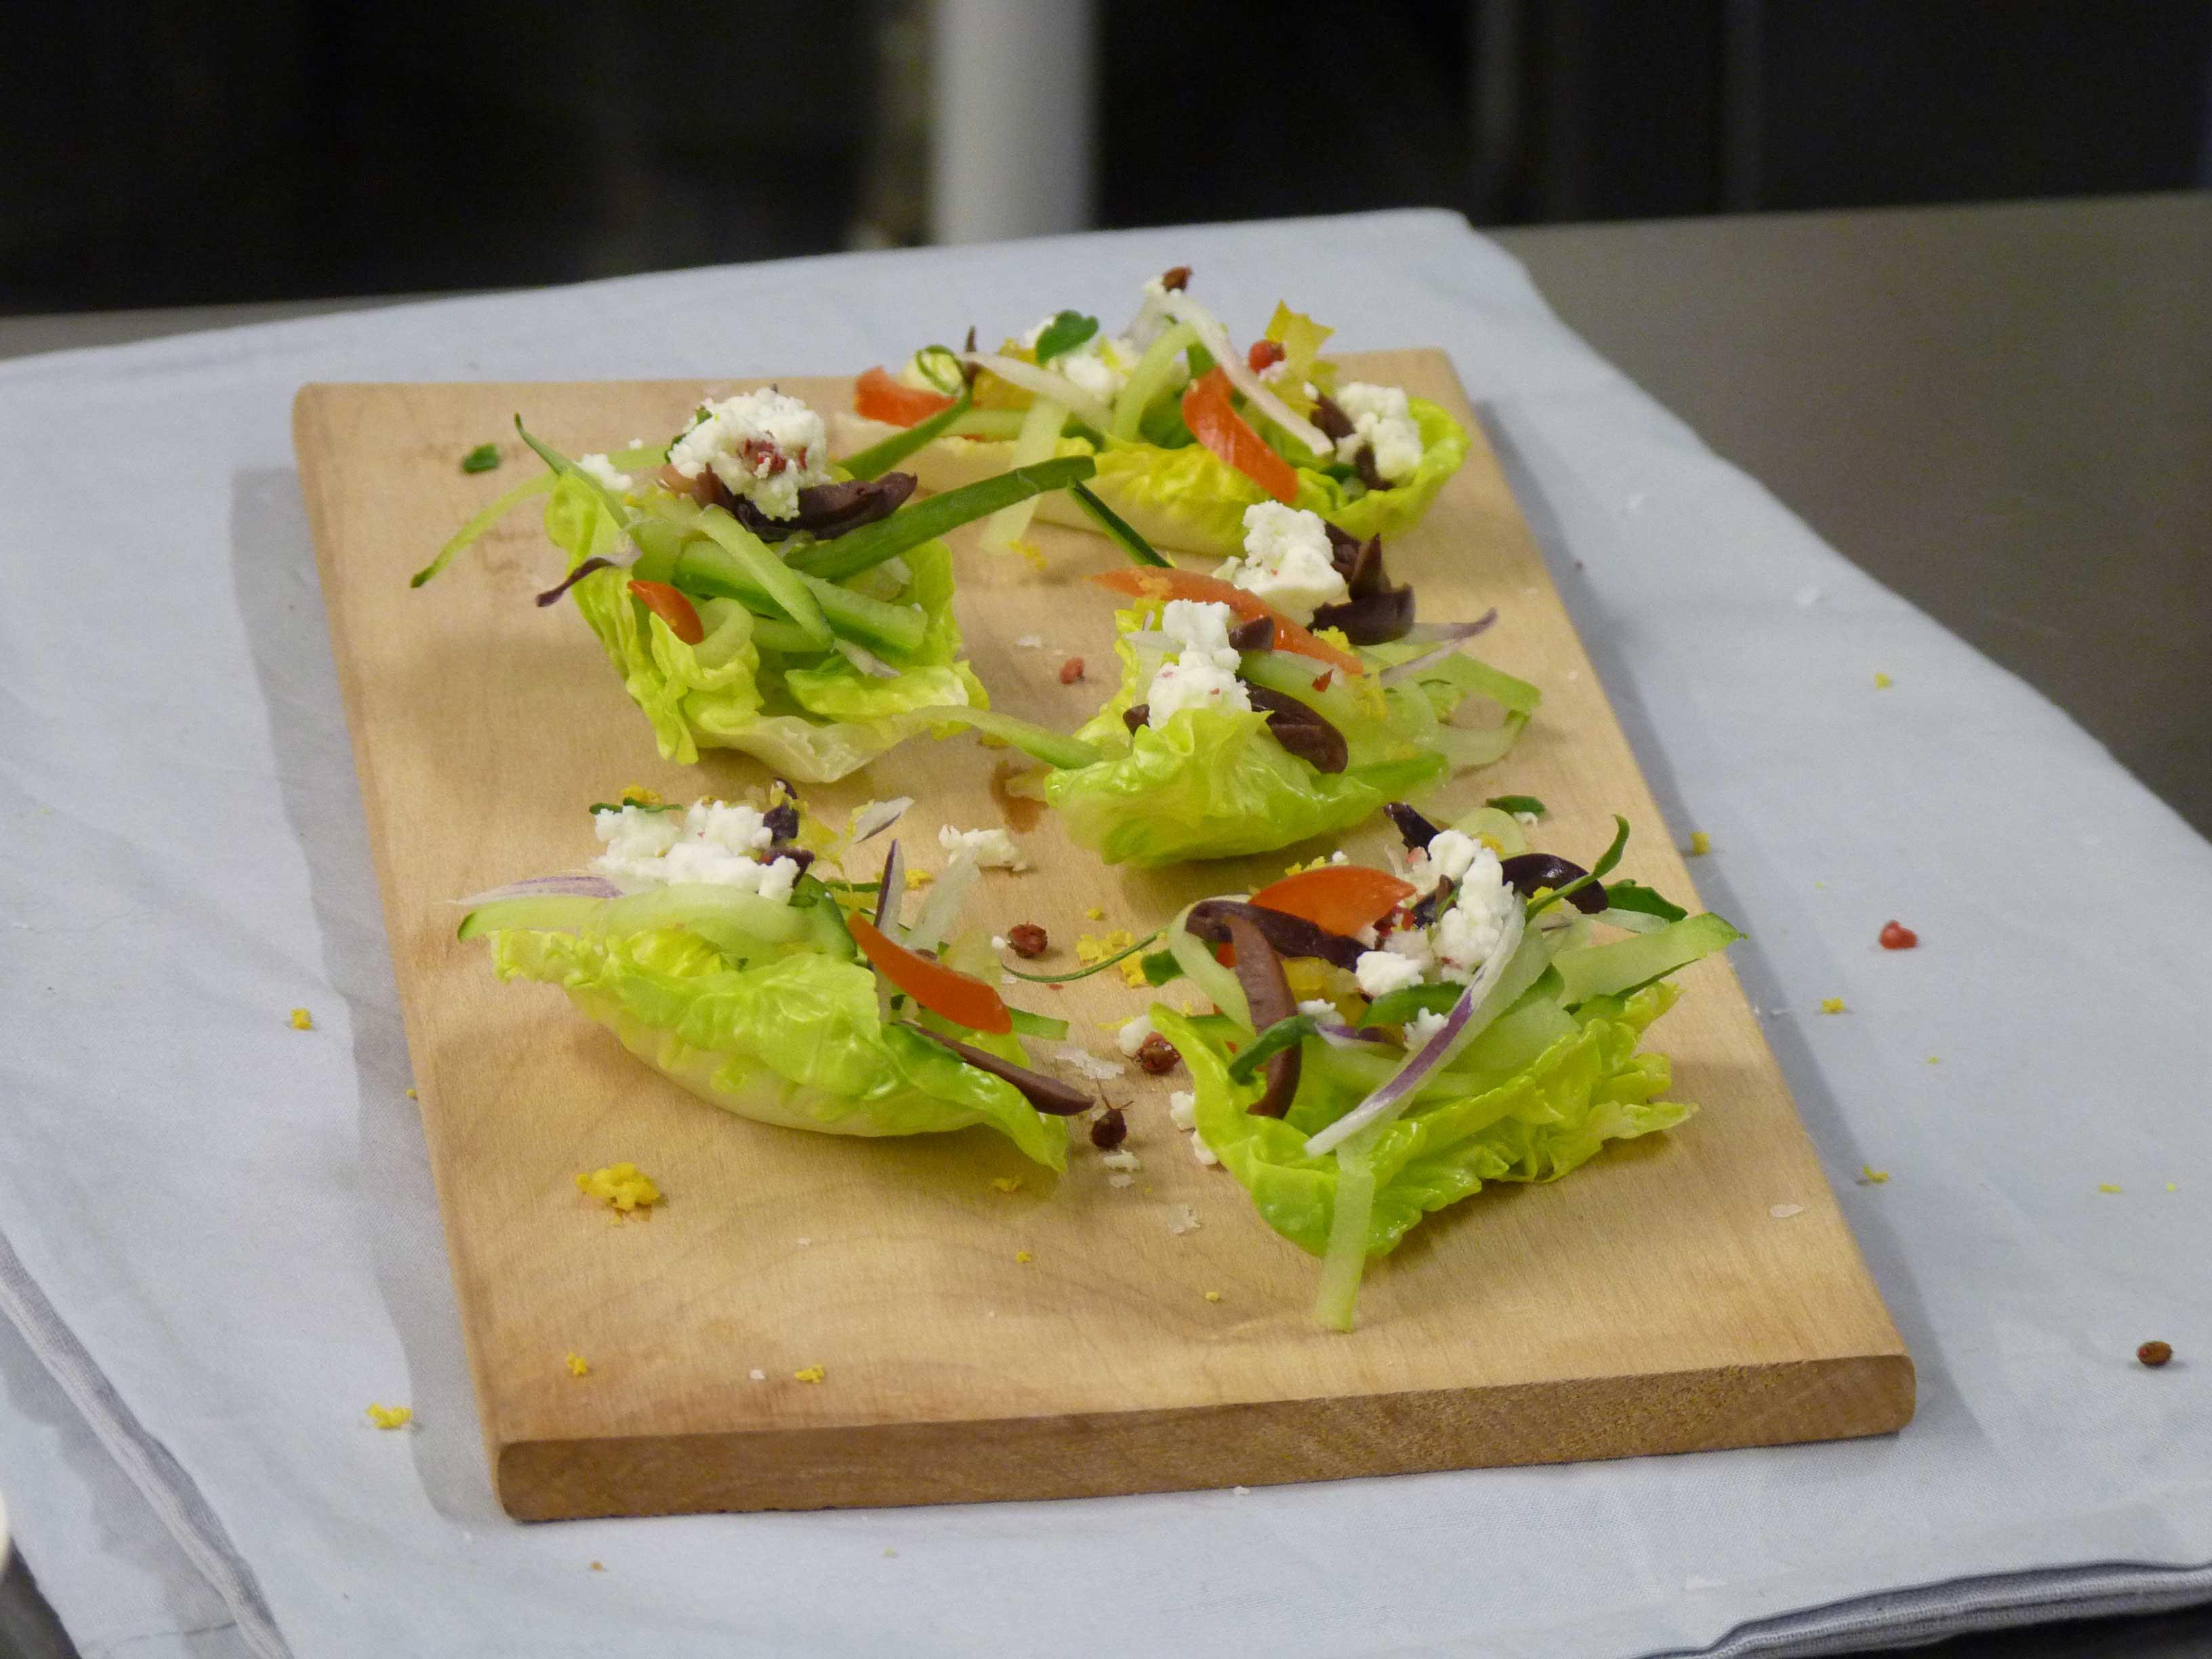 Leiths---Greek-Salad-2